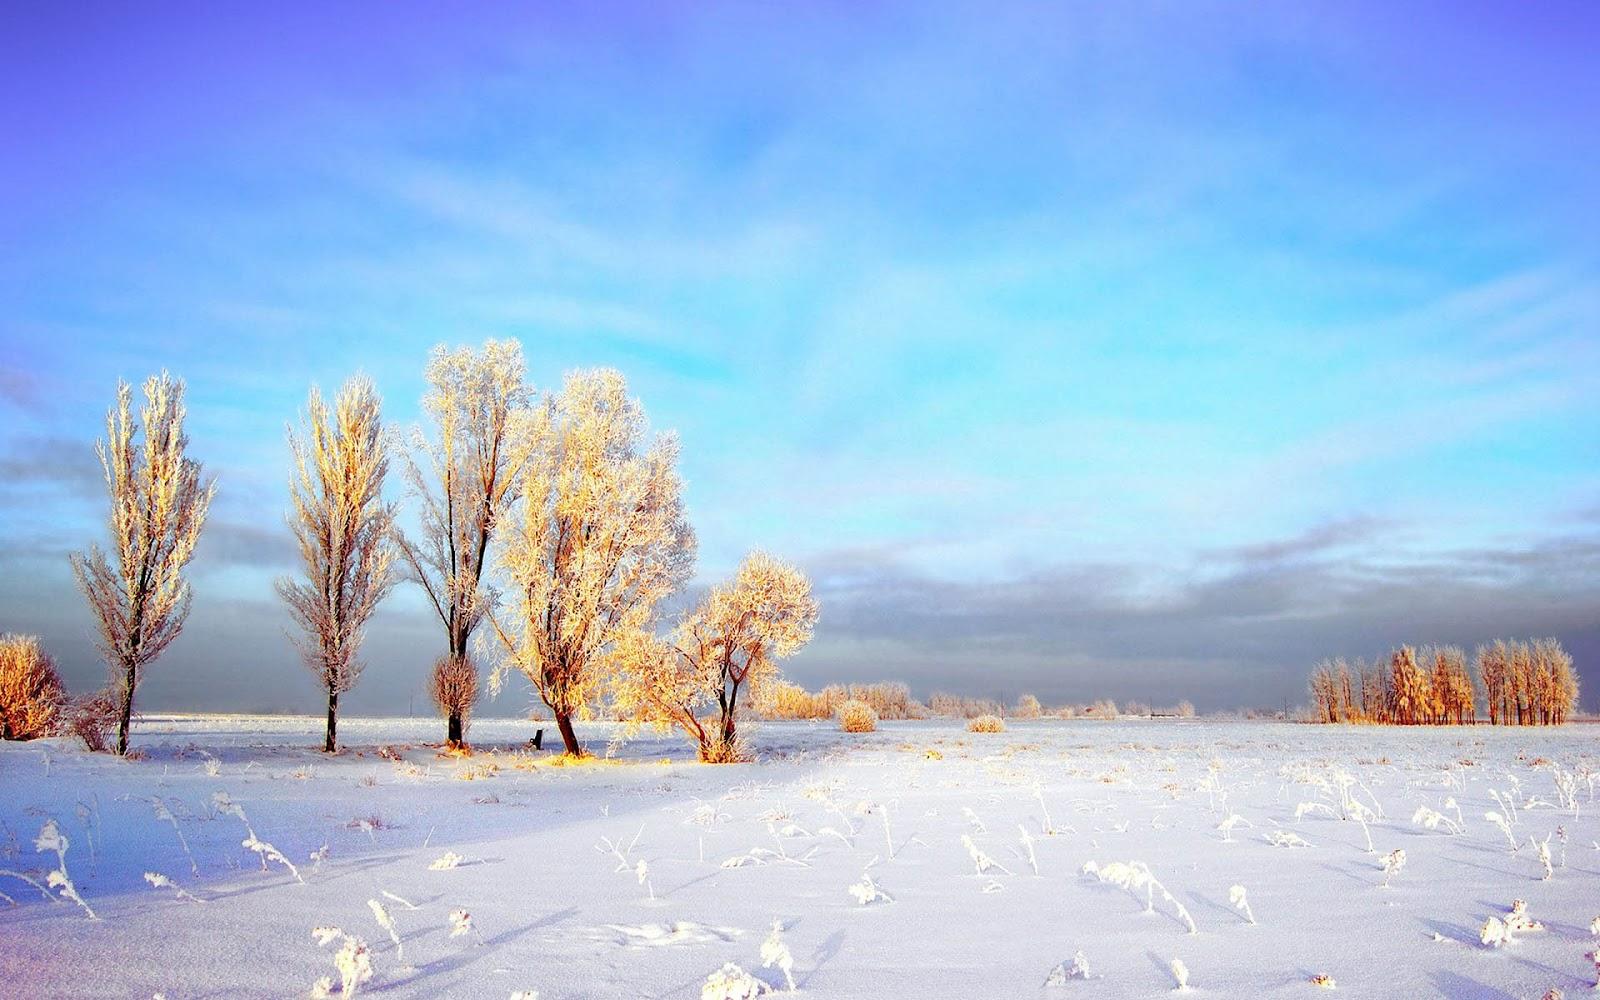 Winter Scenes Wallpaper wallpaper wallpaper hd background 1600x1000